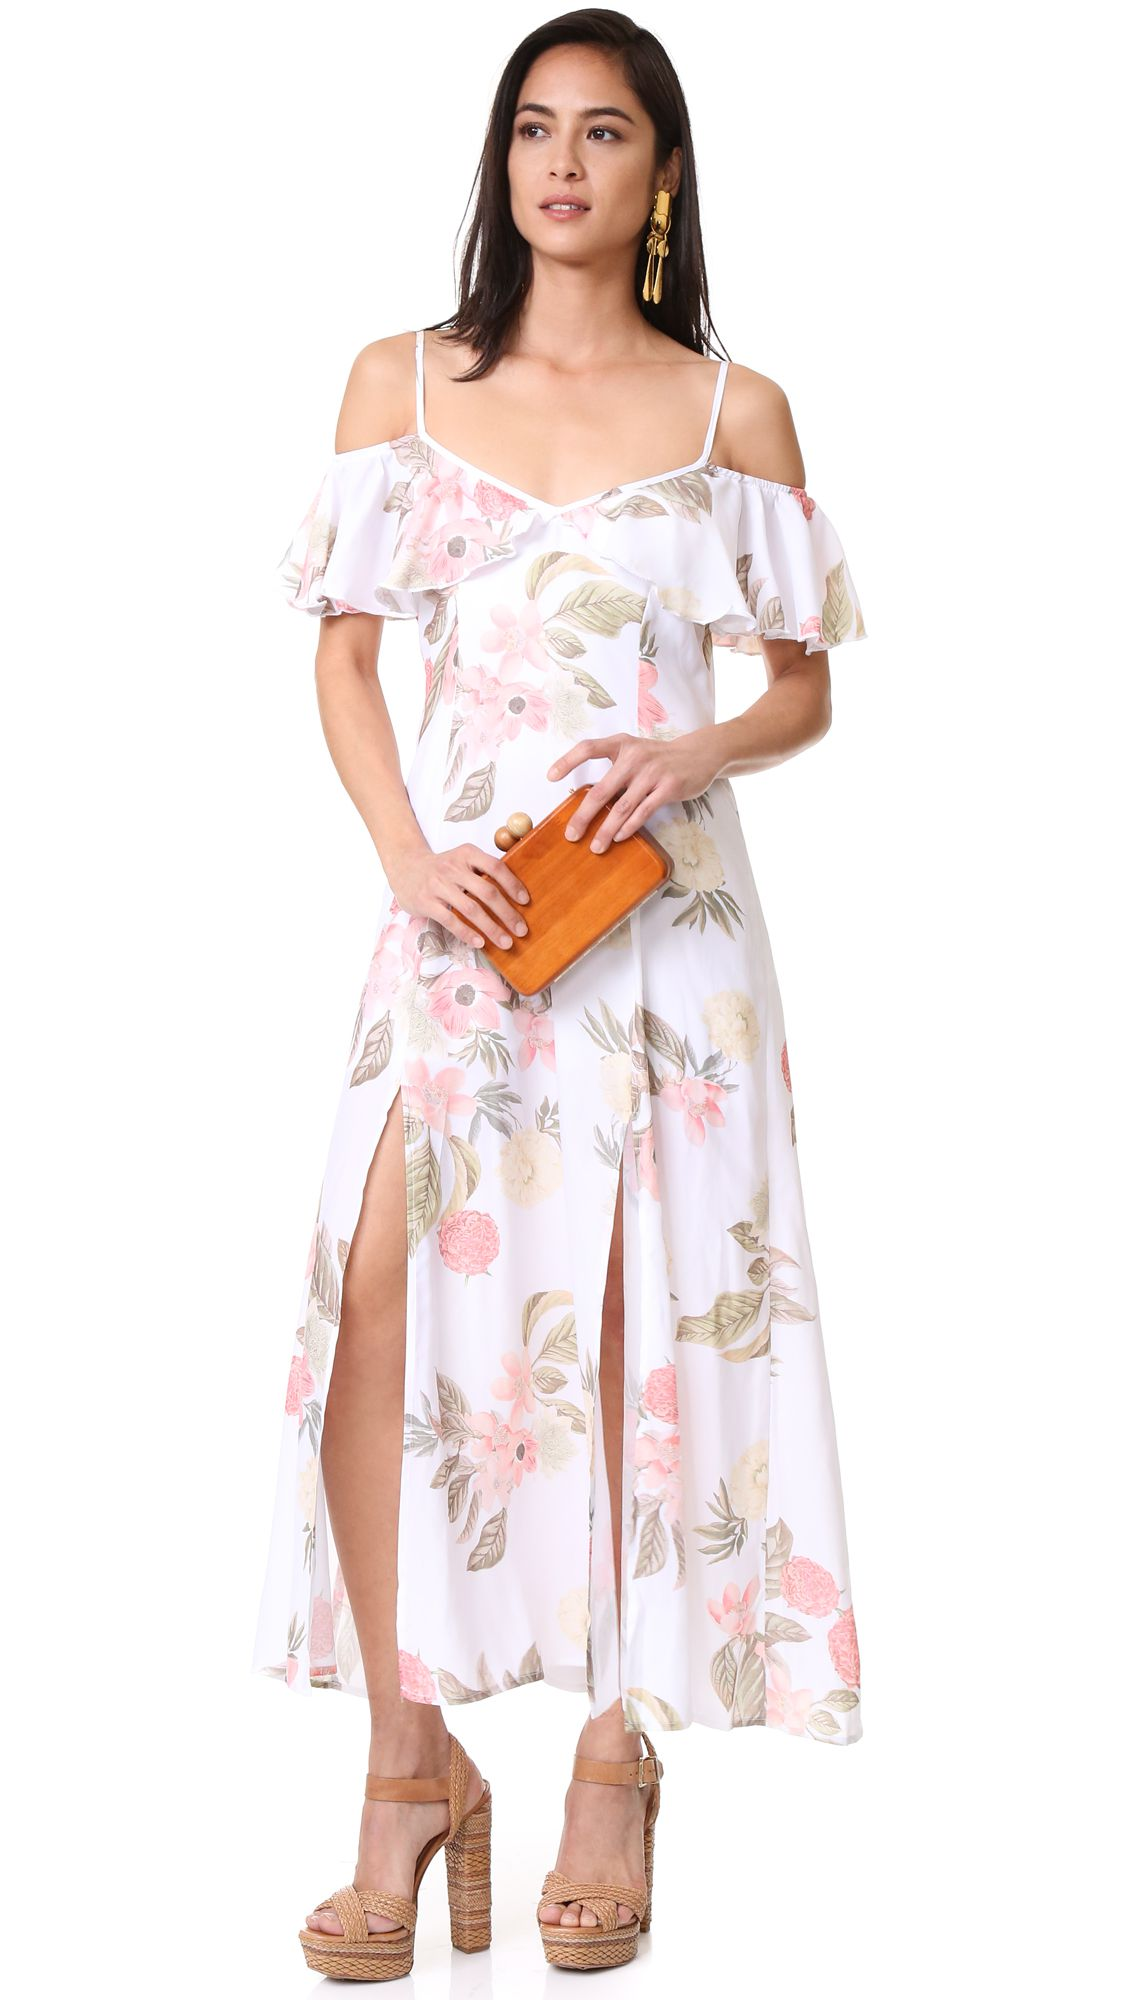 A model wearing a floral ruffle dress